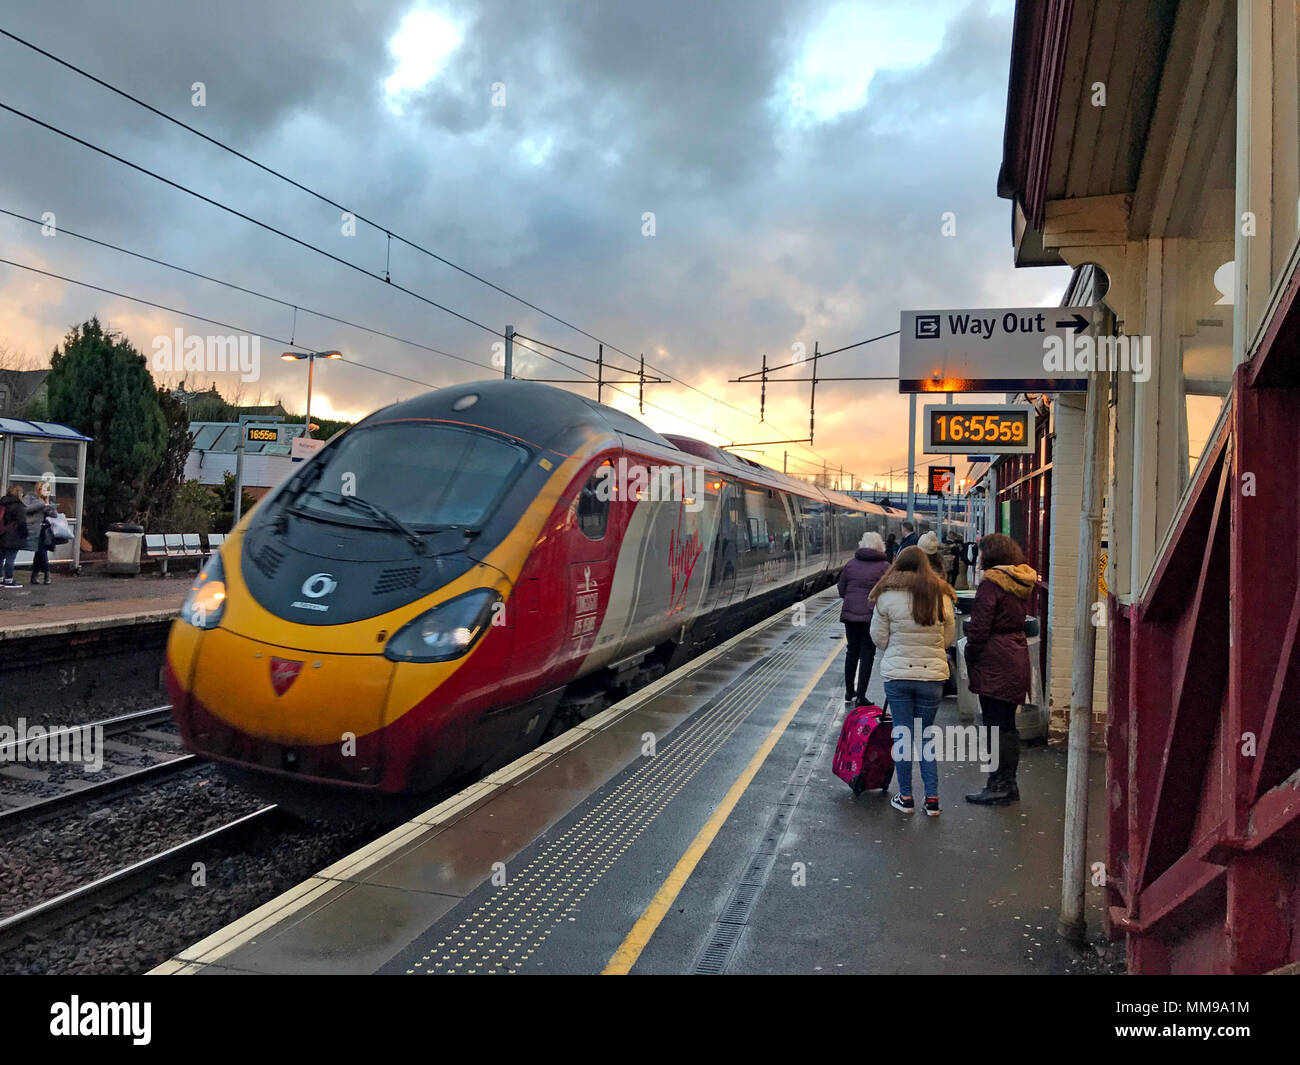 GoTonysmith,@HotpixUK,train,arrives,arriving,rail,sunset,sunrise,at,city,platform,town,north,Lanarkshire,evening,UK,GB,passenger,passengers,dramatic,tilting,tilting